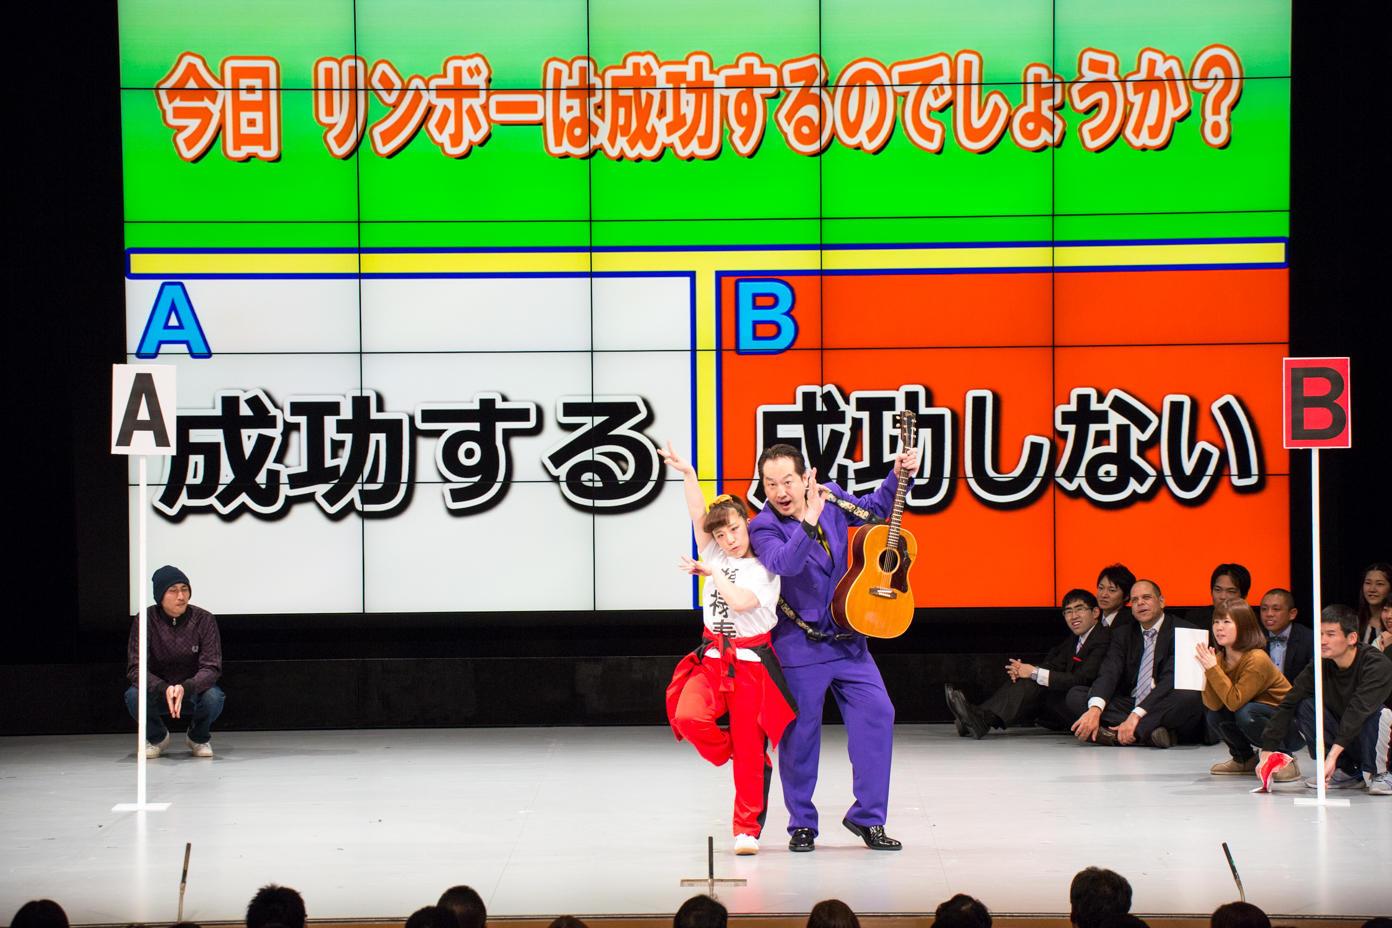 http://news.yoshimoto.co.jp/20180101200618-294ed195c264f8faae8e5c530f2a70c17784947c.jpg